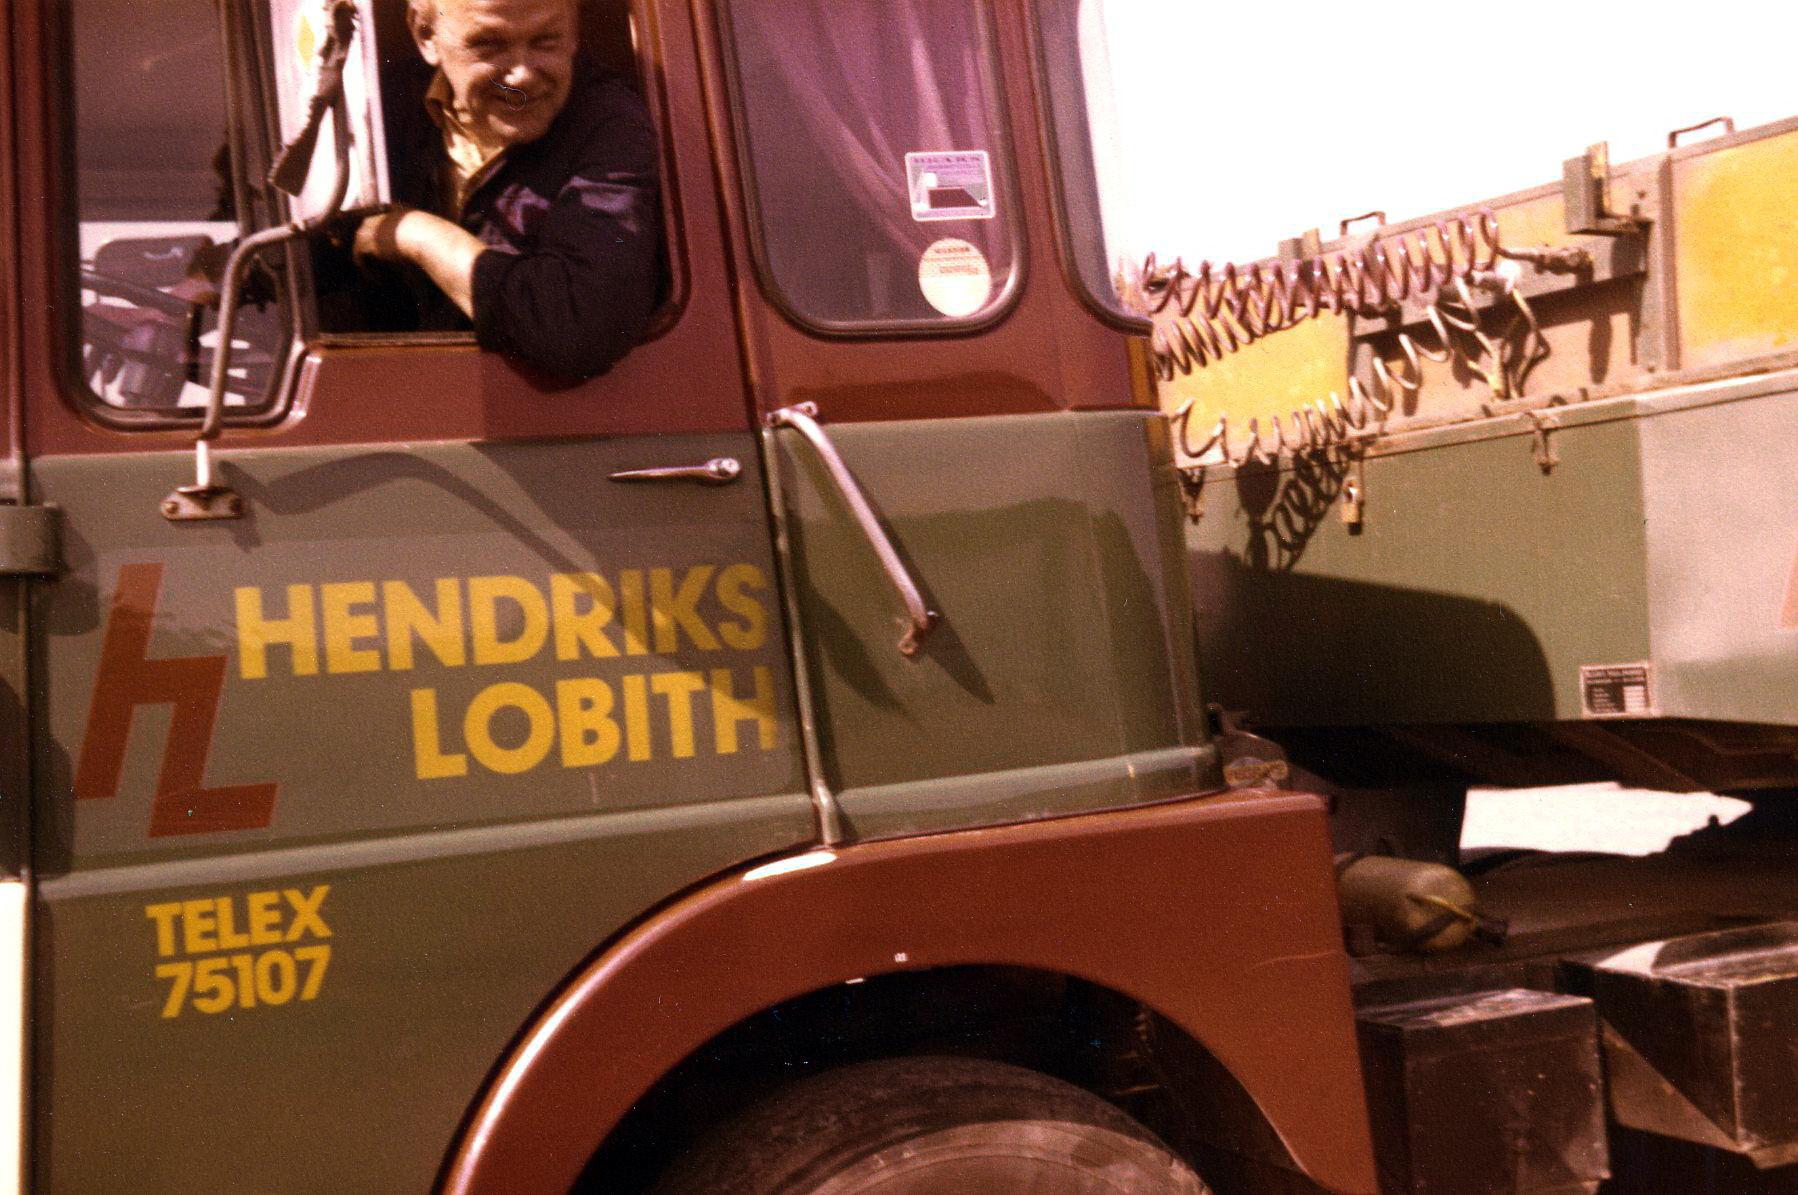 hendriks-lobith-141